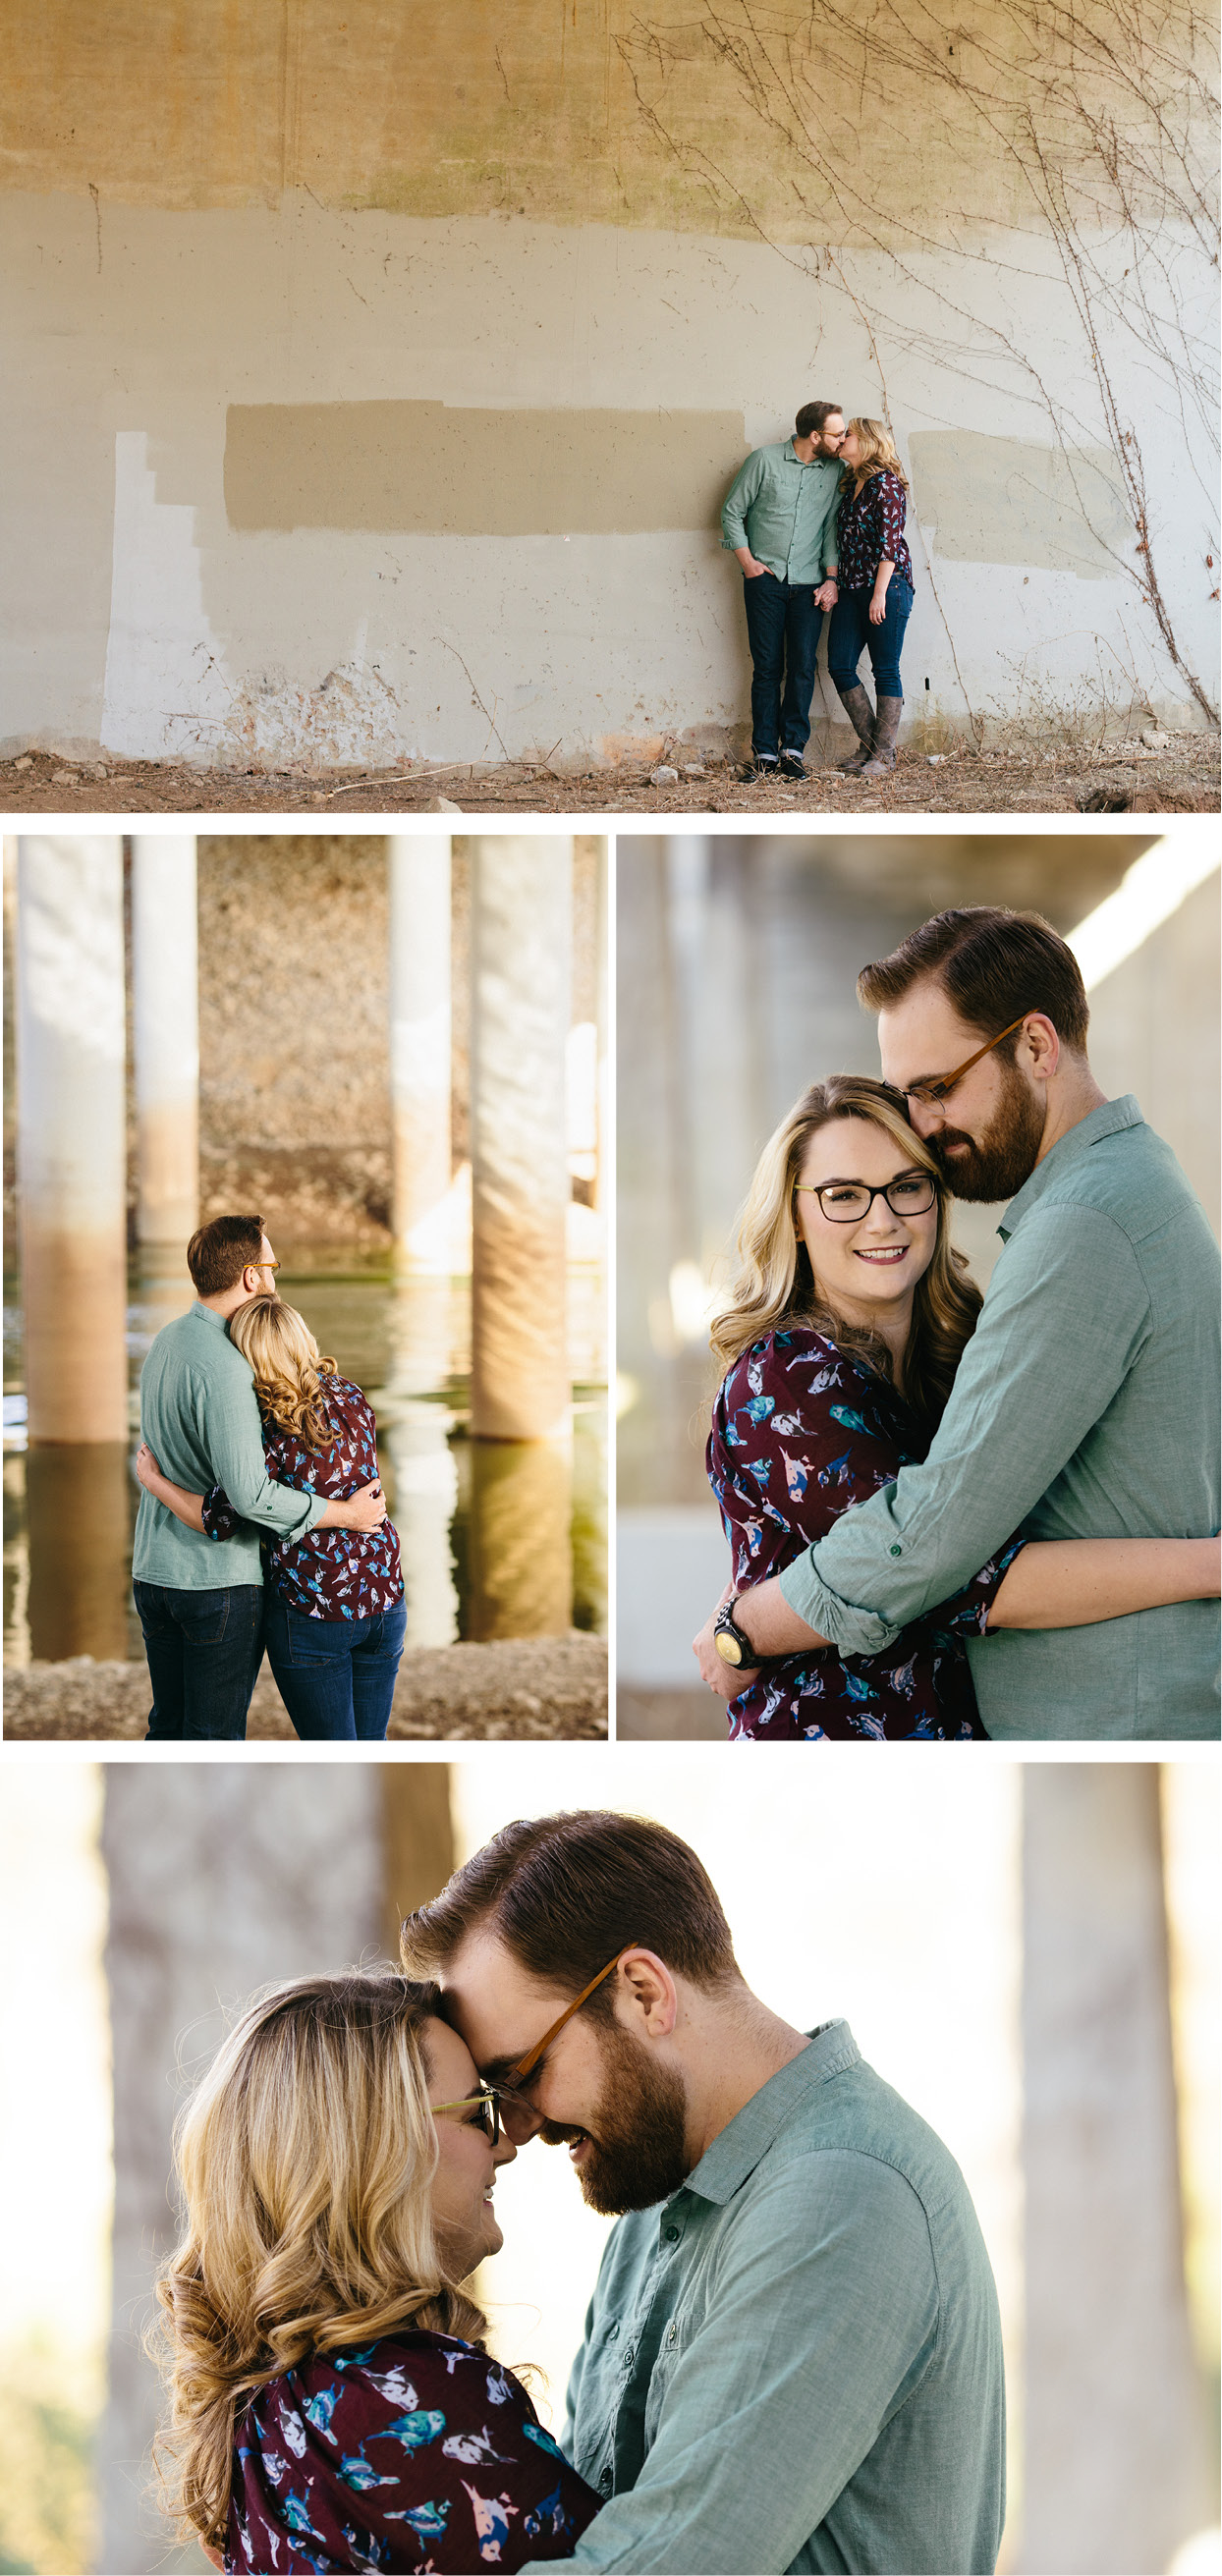 CK-Photo-Nashville-Engagement-Photographer-st-3.jpg